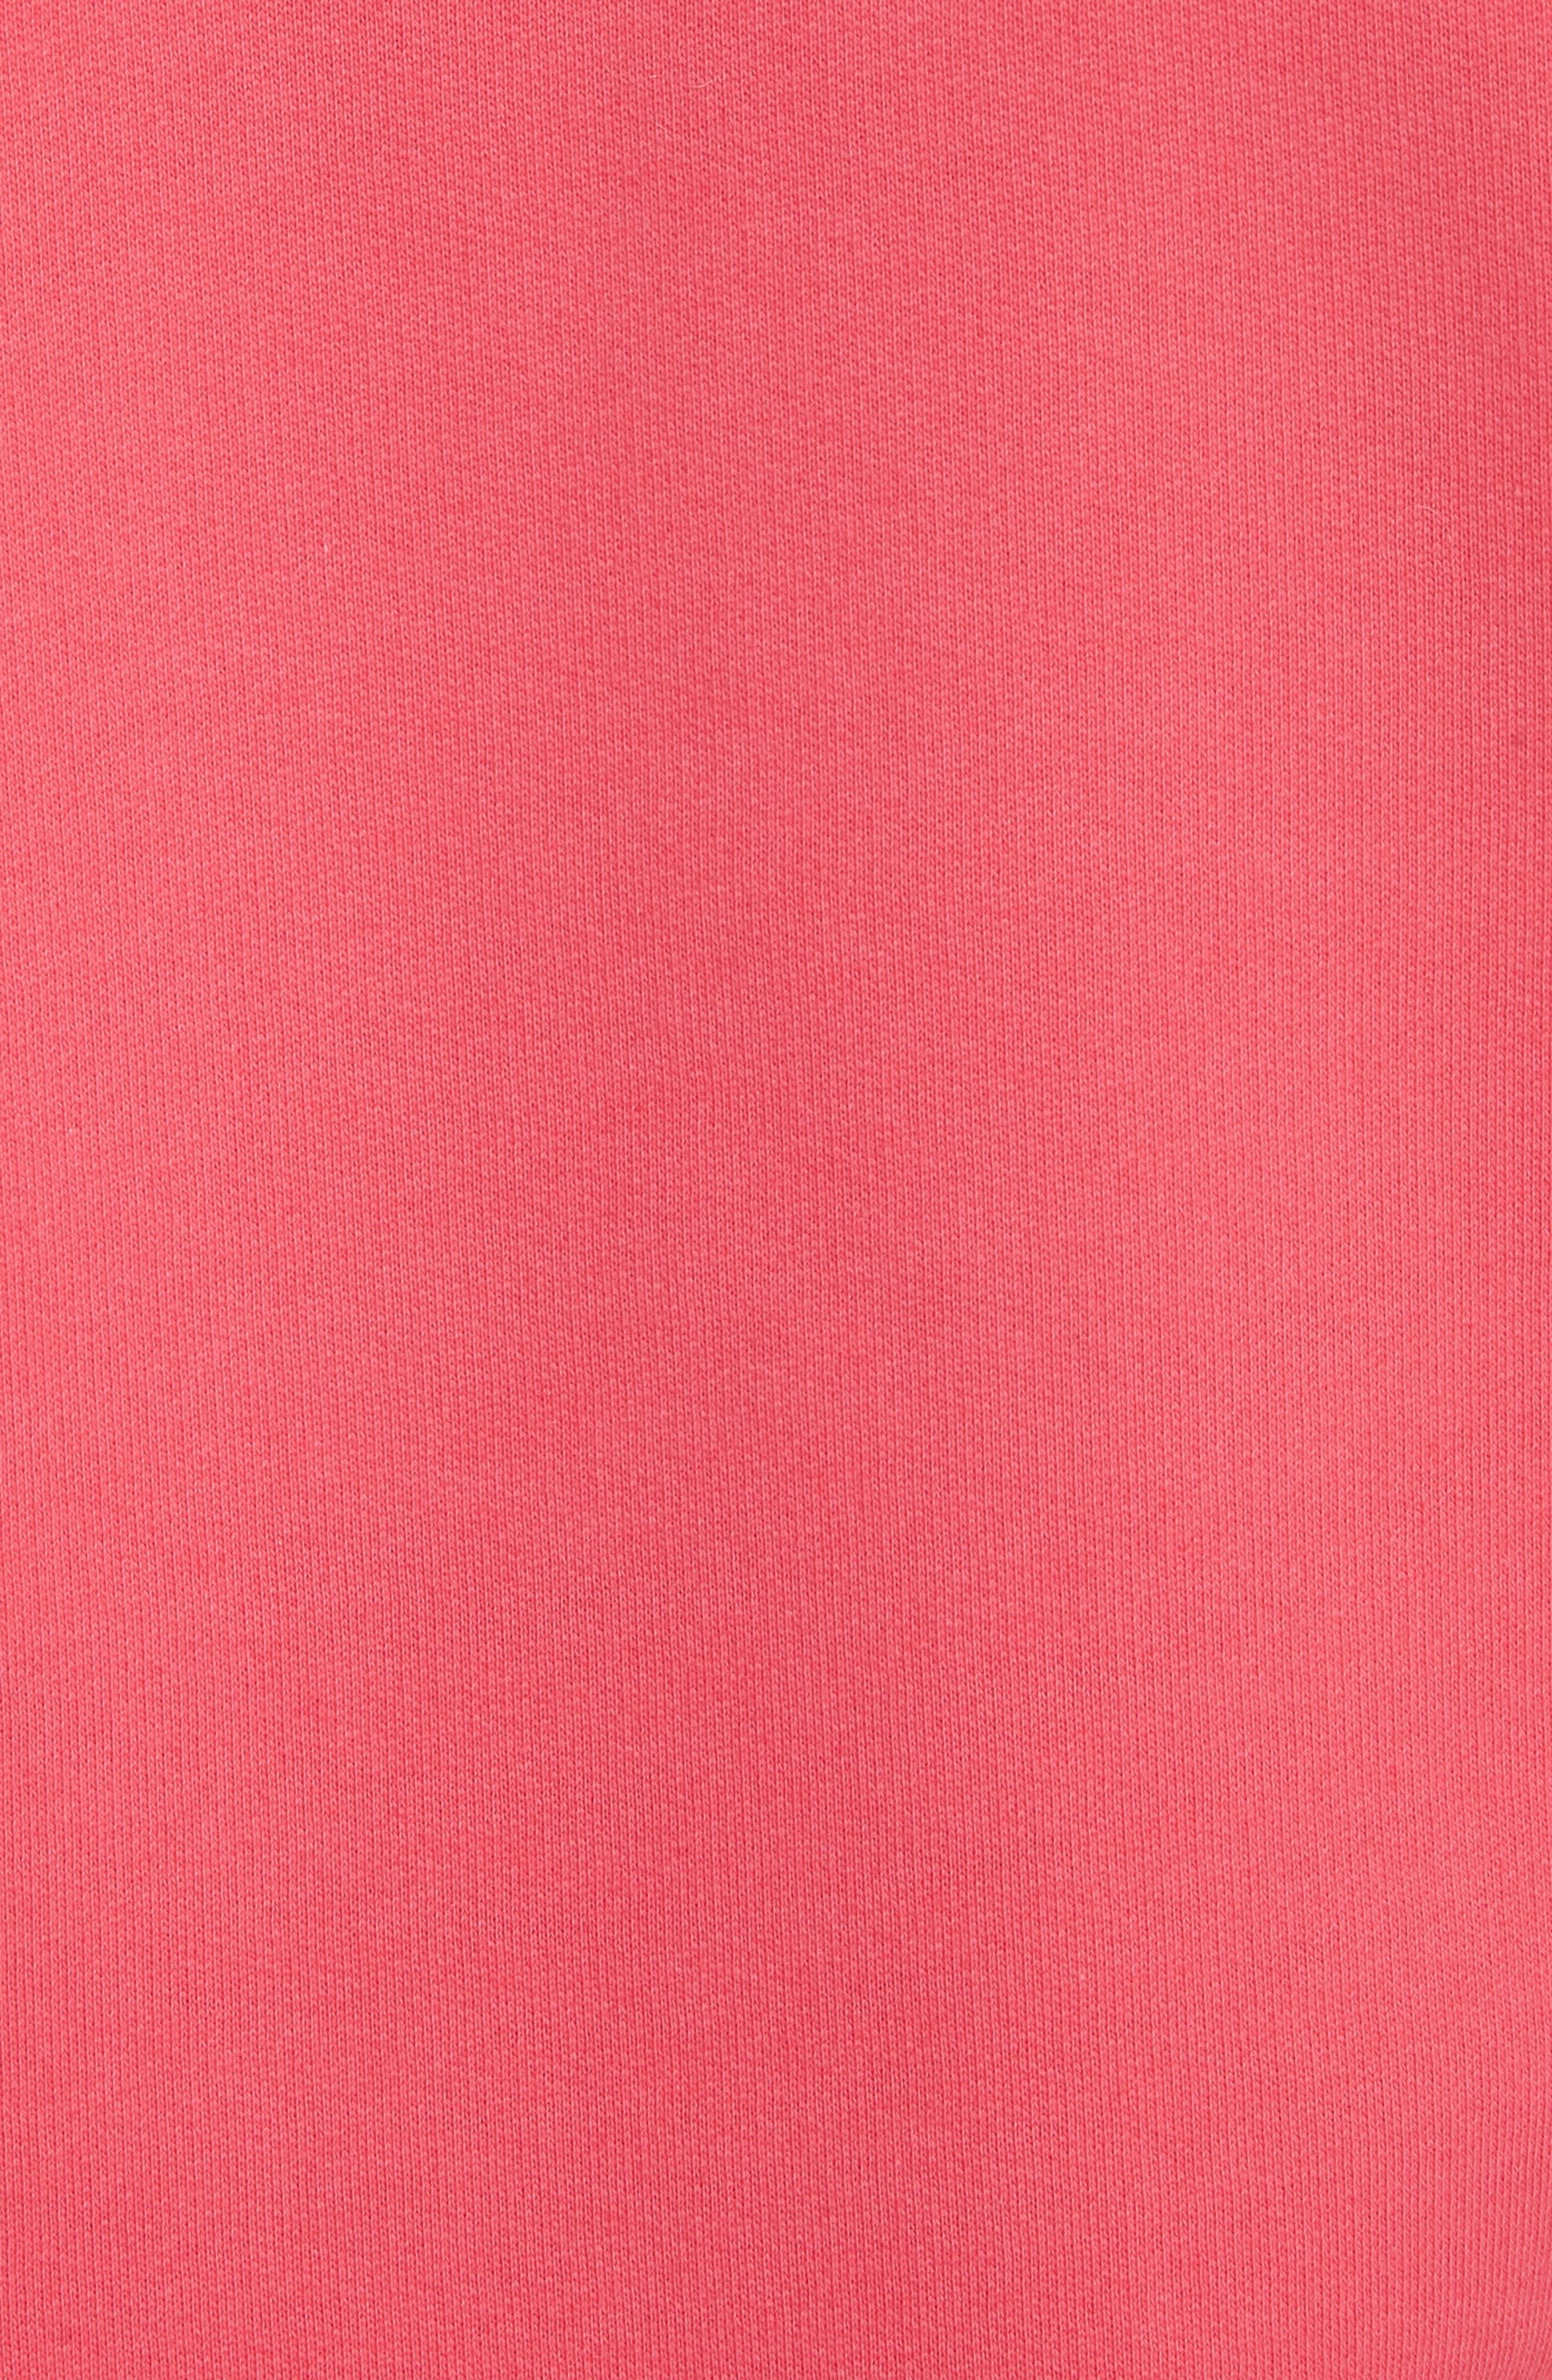 Fairview Crewneck Sweatshirt,                             Alternate thumbnail 6, color,                             Neon Pink